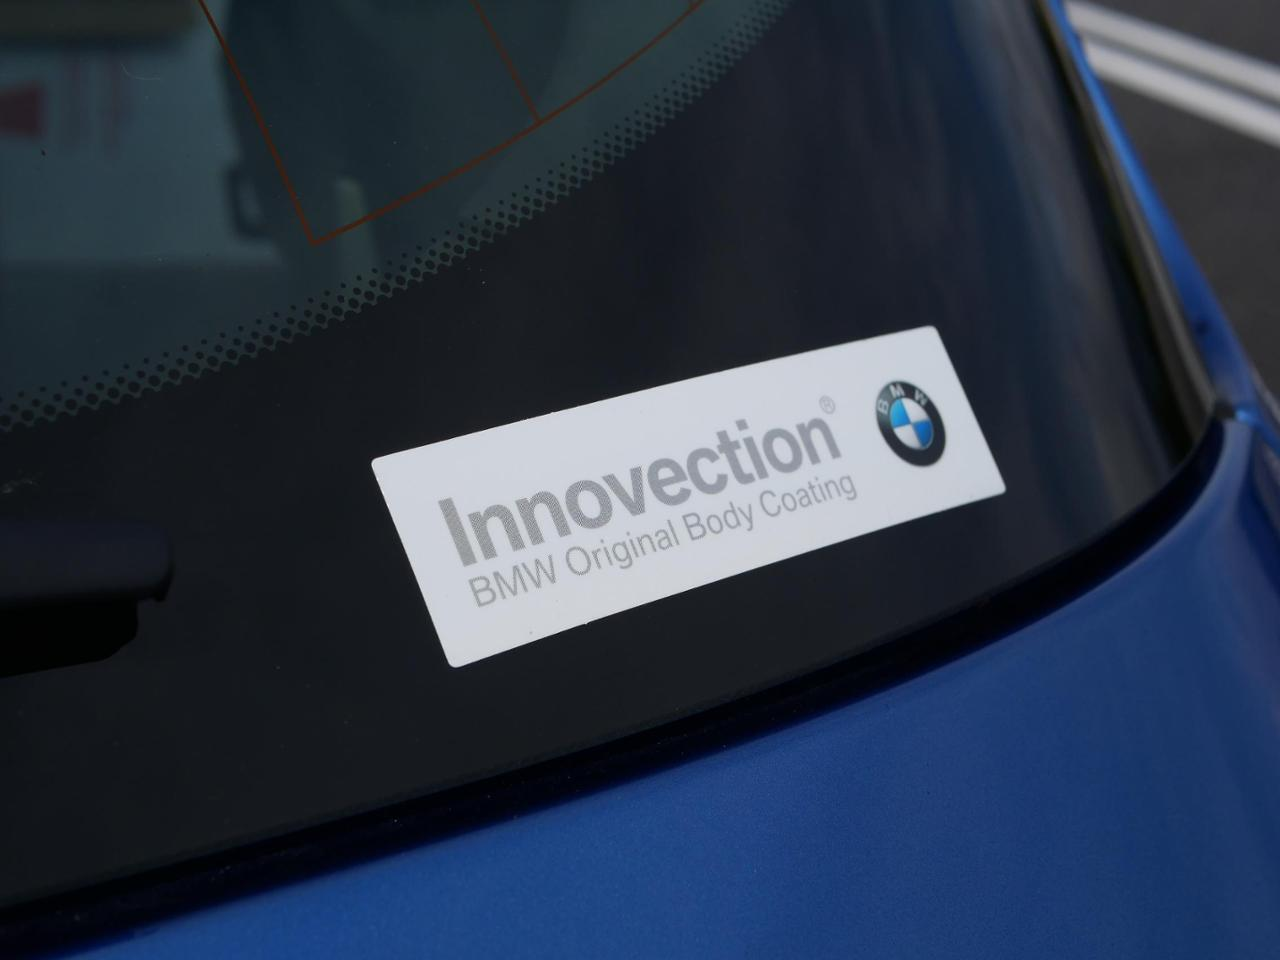 BMW(純正) BMW(純正) Innovection Original Body Coating